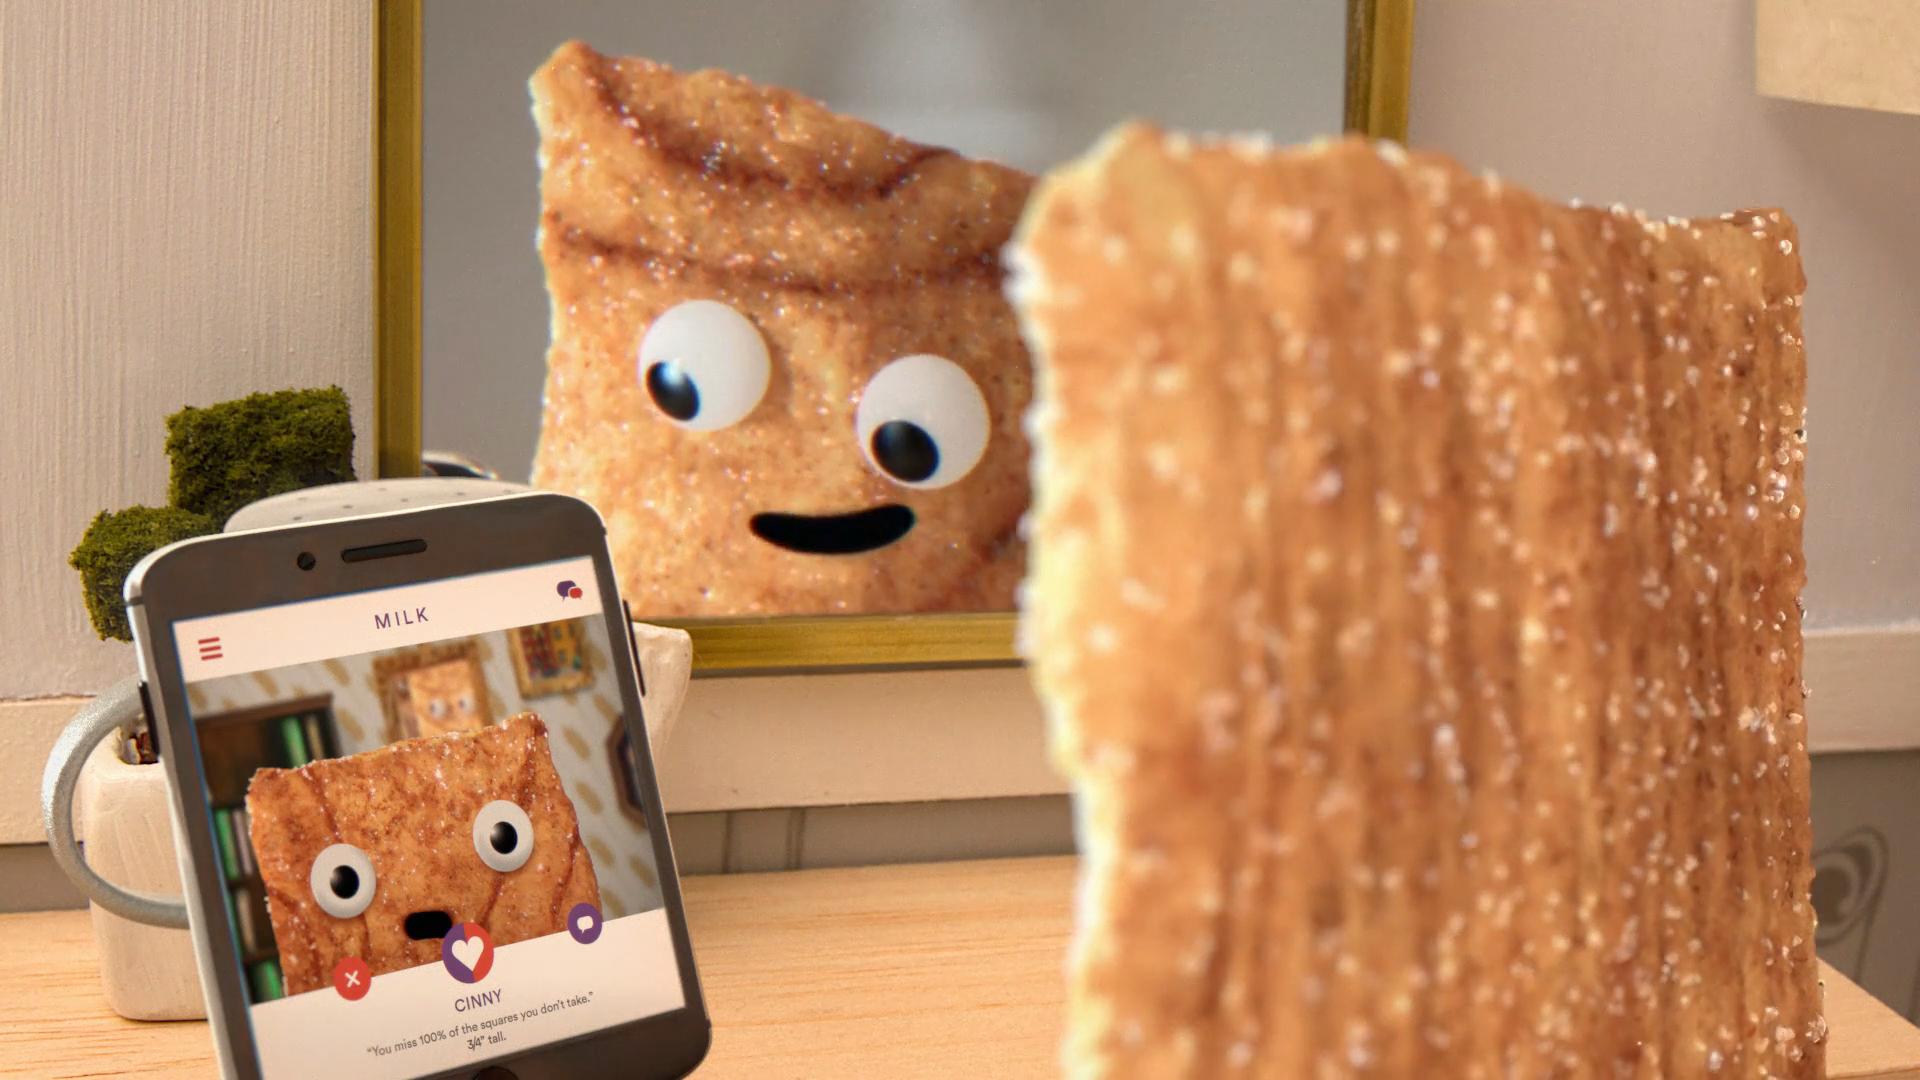 Cinnamon Toast Crunch: Swiping